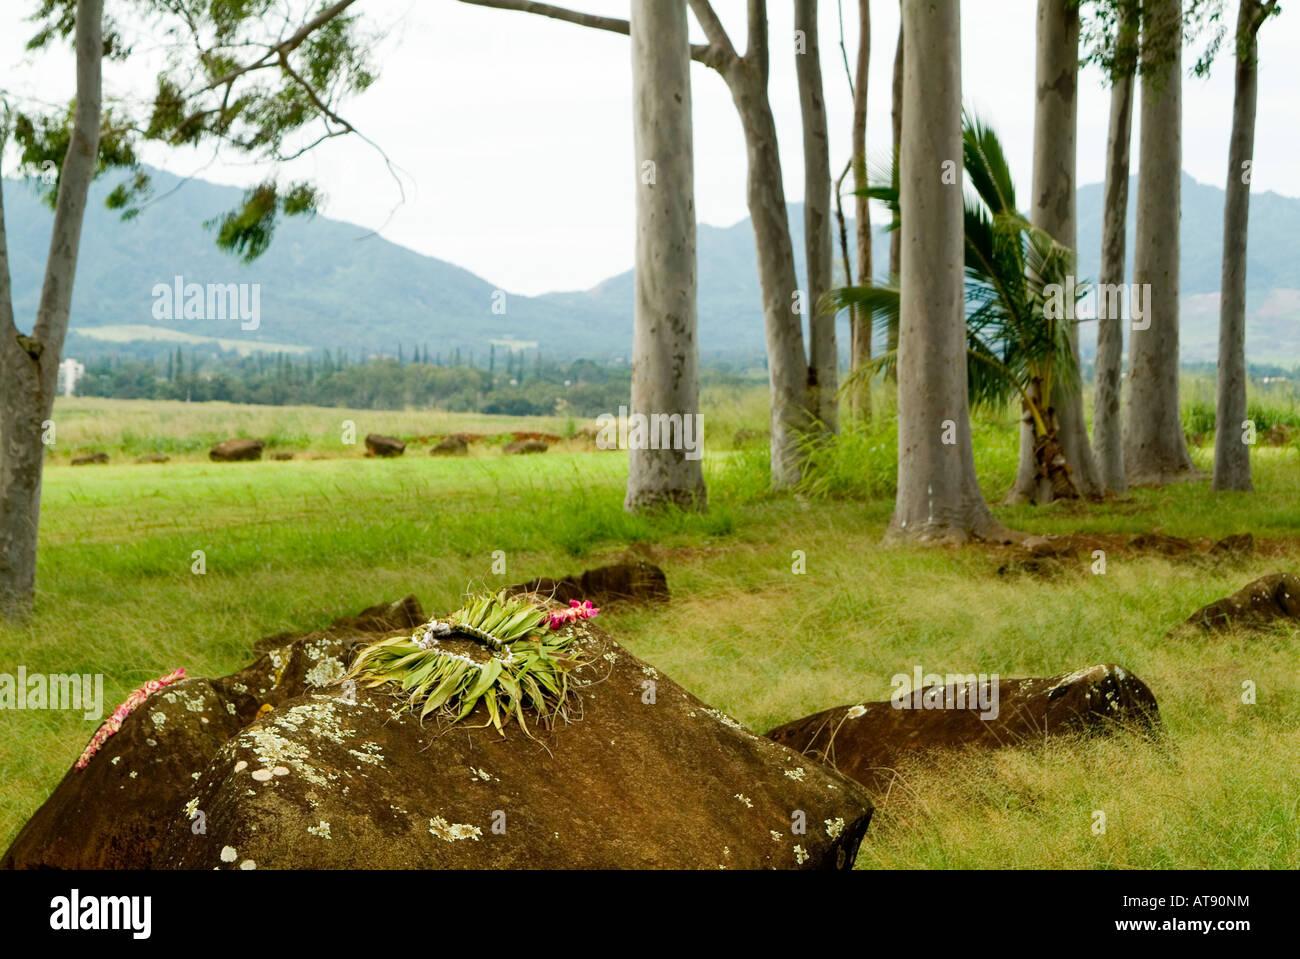 Estado Kukaniloko monumento histórico (piedras) de parto real en Wahiawa, Oahu. Close-up de piedra con lei ofrendas. Foto de stock